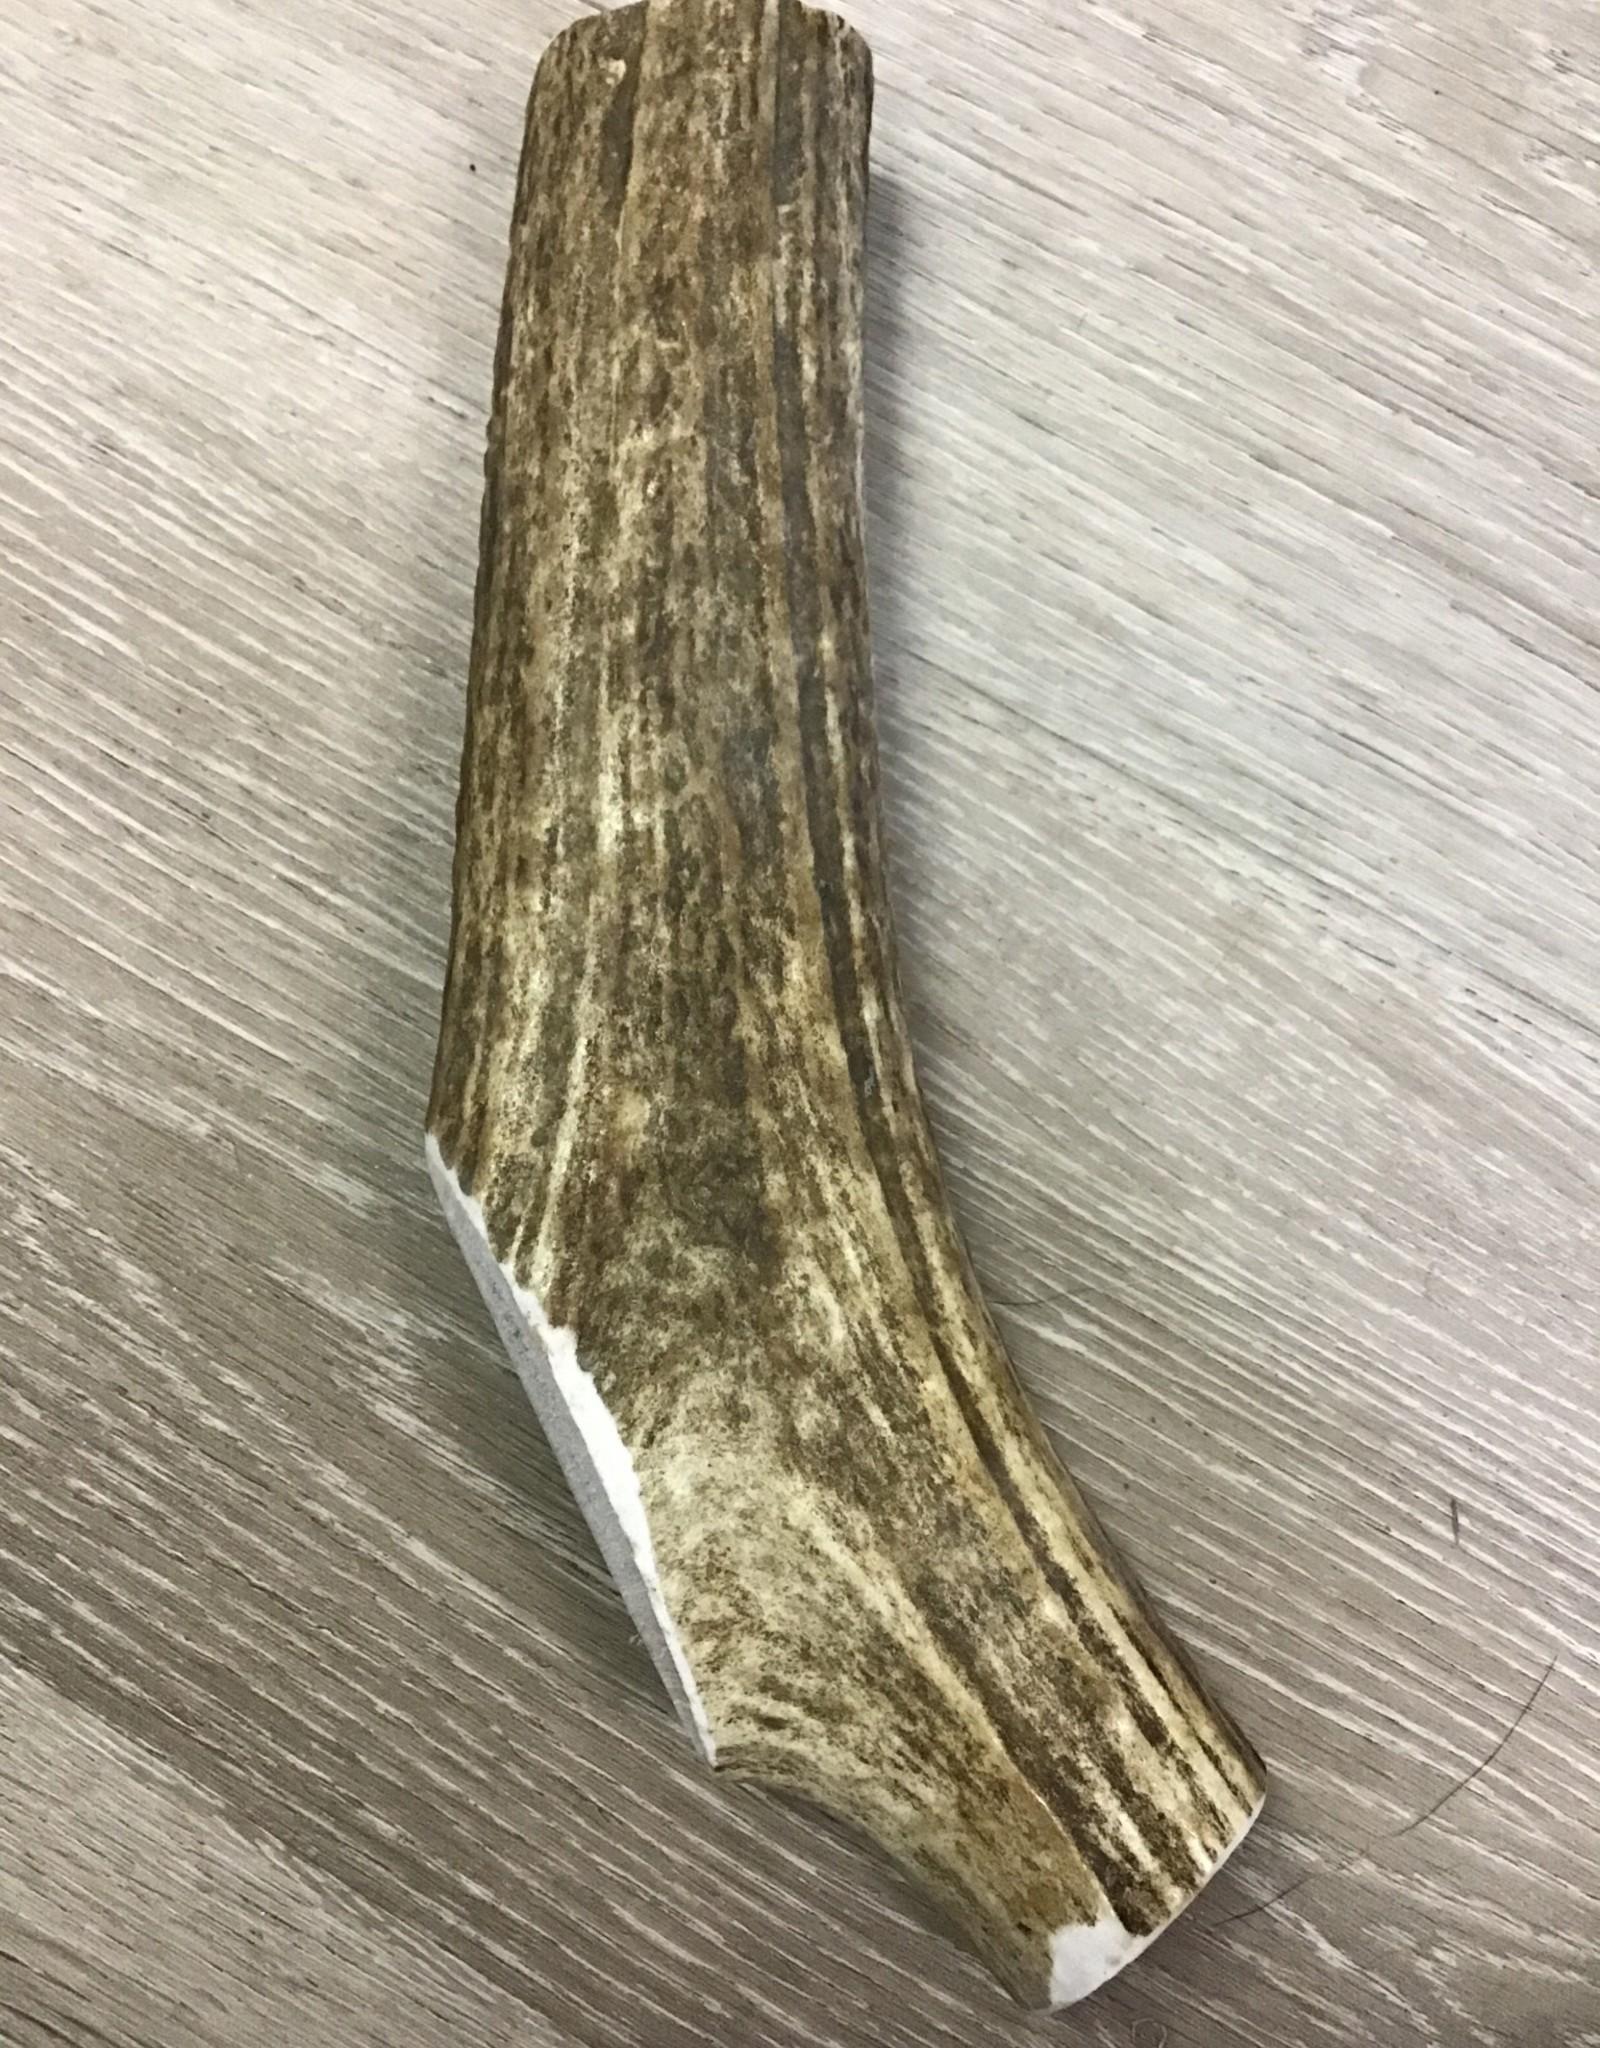 Whole Large Antler